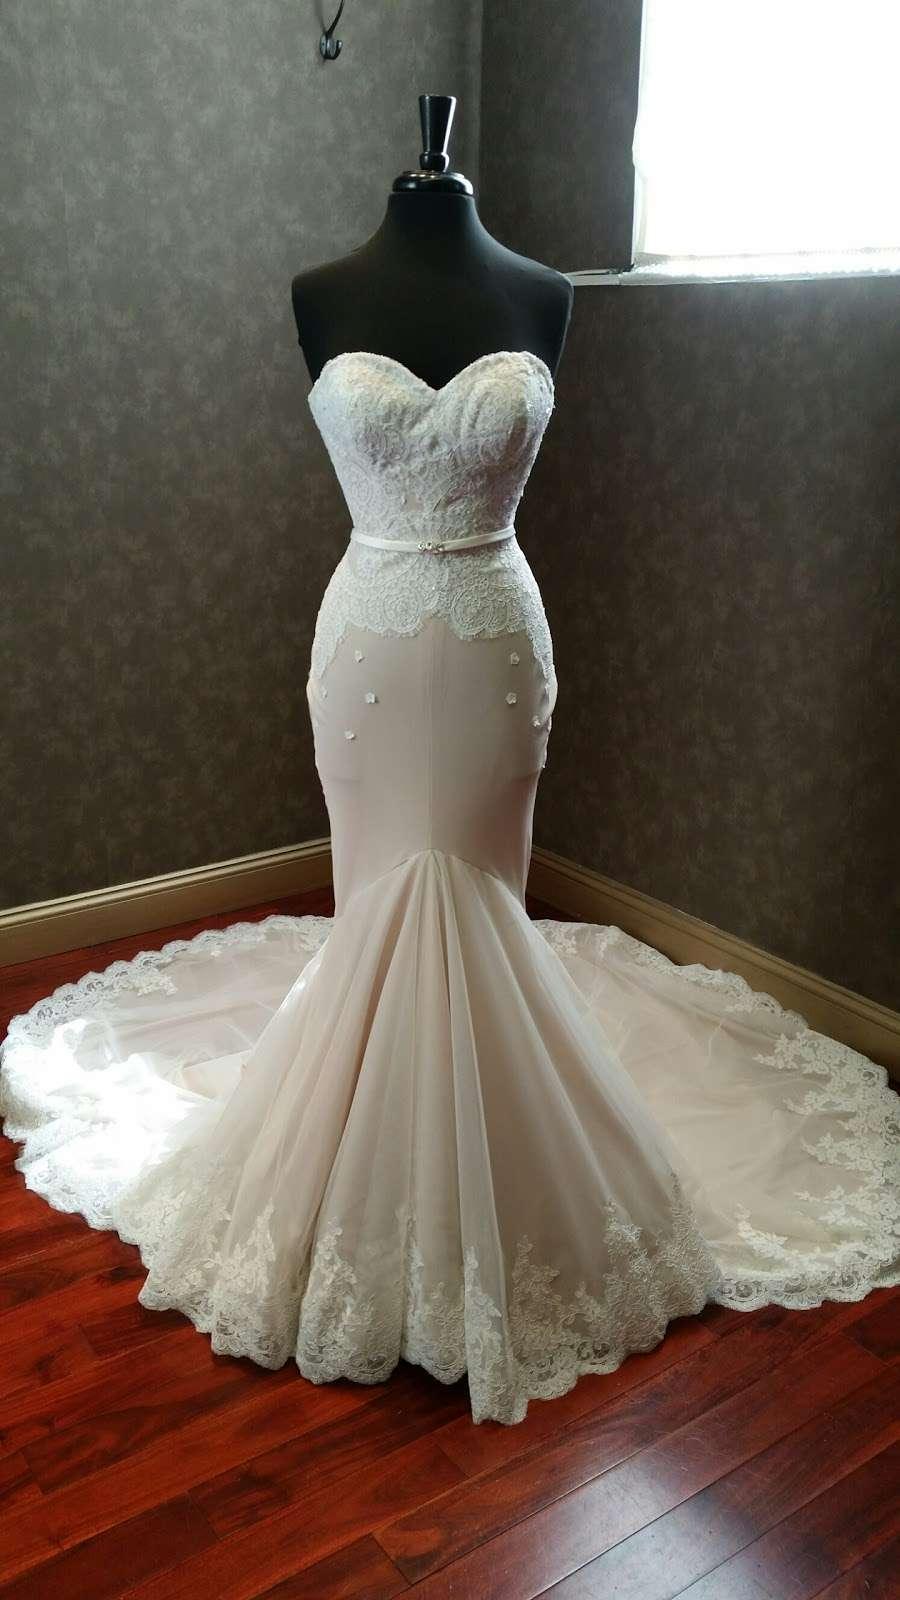 Couture de Bride - clothing store    Photo 9 of 10   Address: 406 Cedar Ln, Teaneck, NJ 07666, USA   Phone: (201) 357-4877